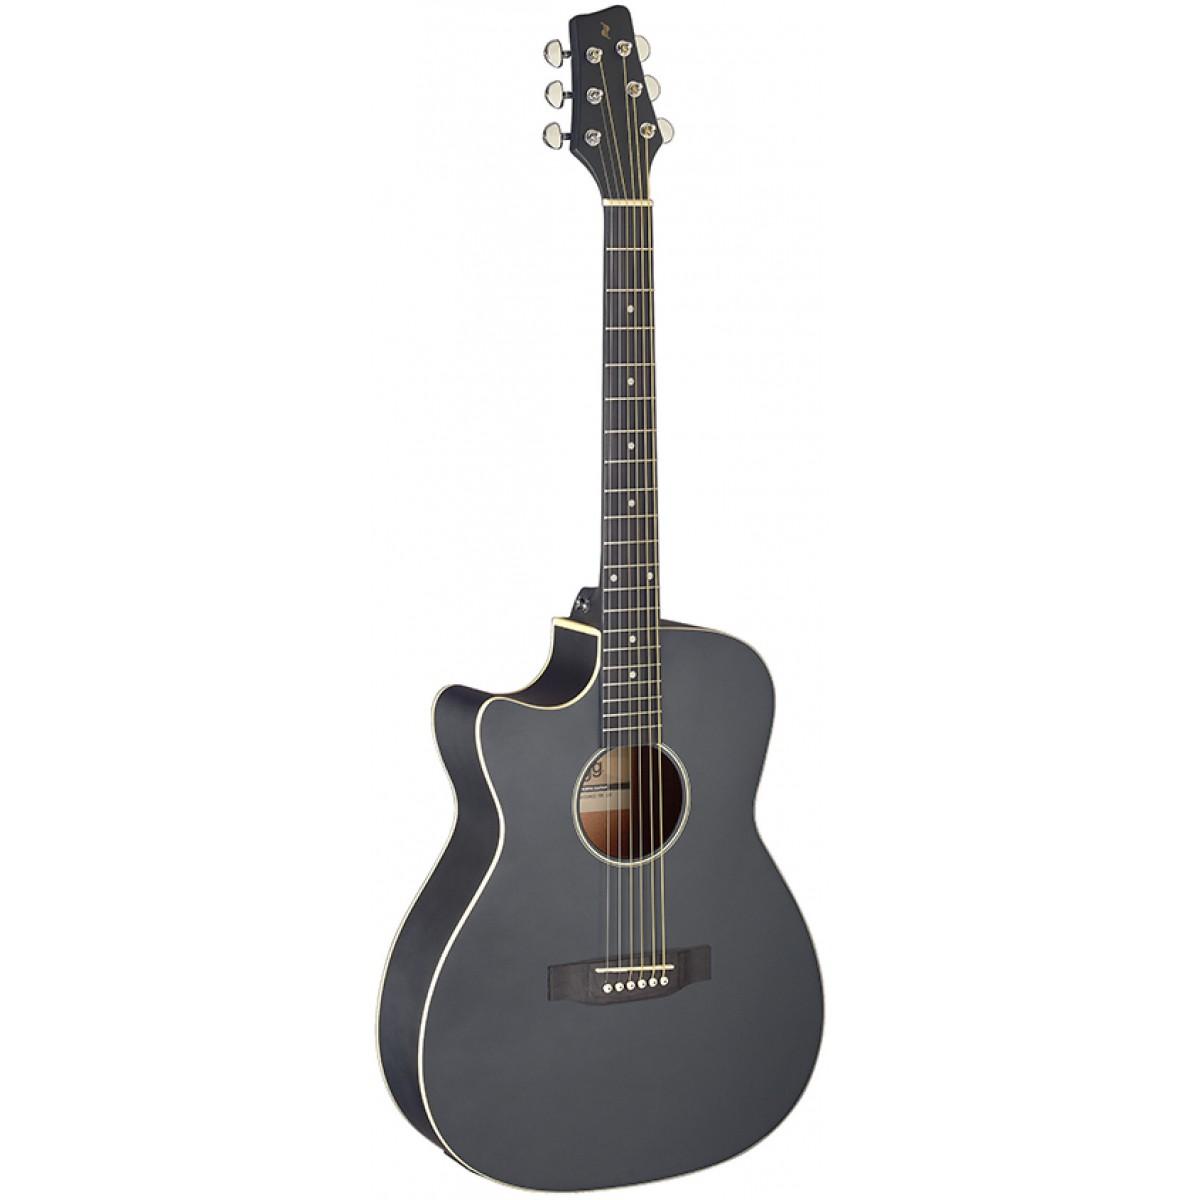 Stagg SA35 ACE-BK LH, elektroakustická kytara levoruká